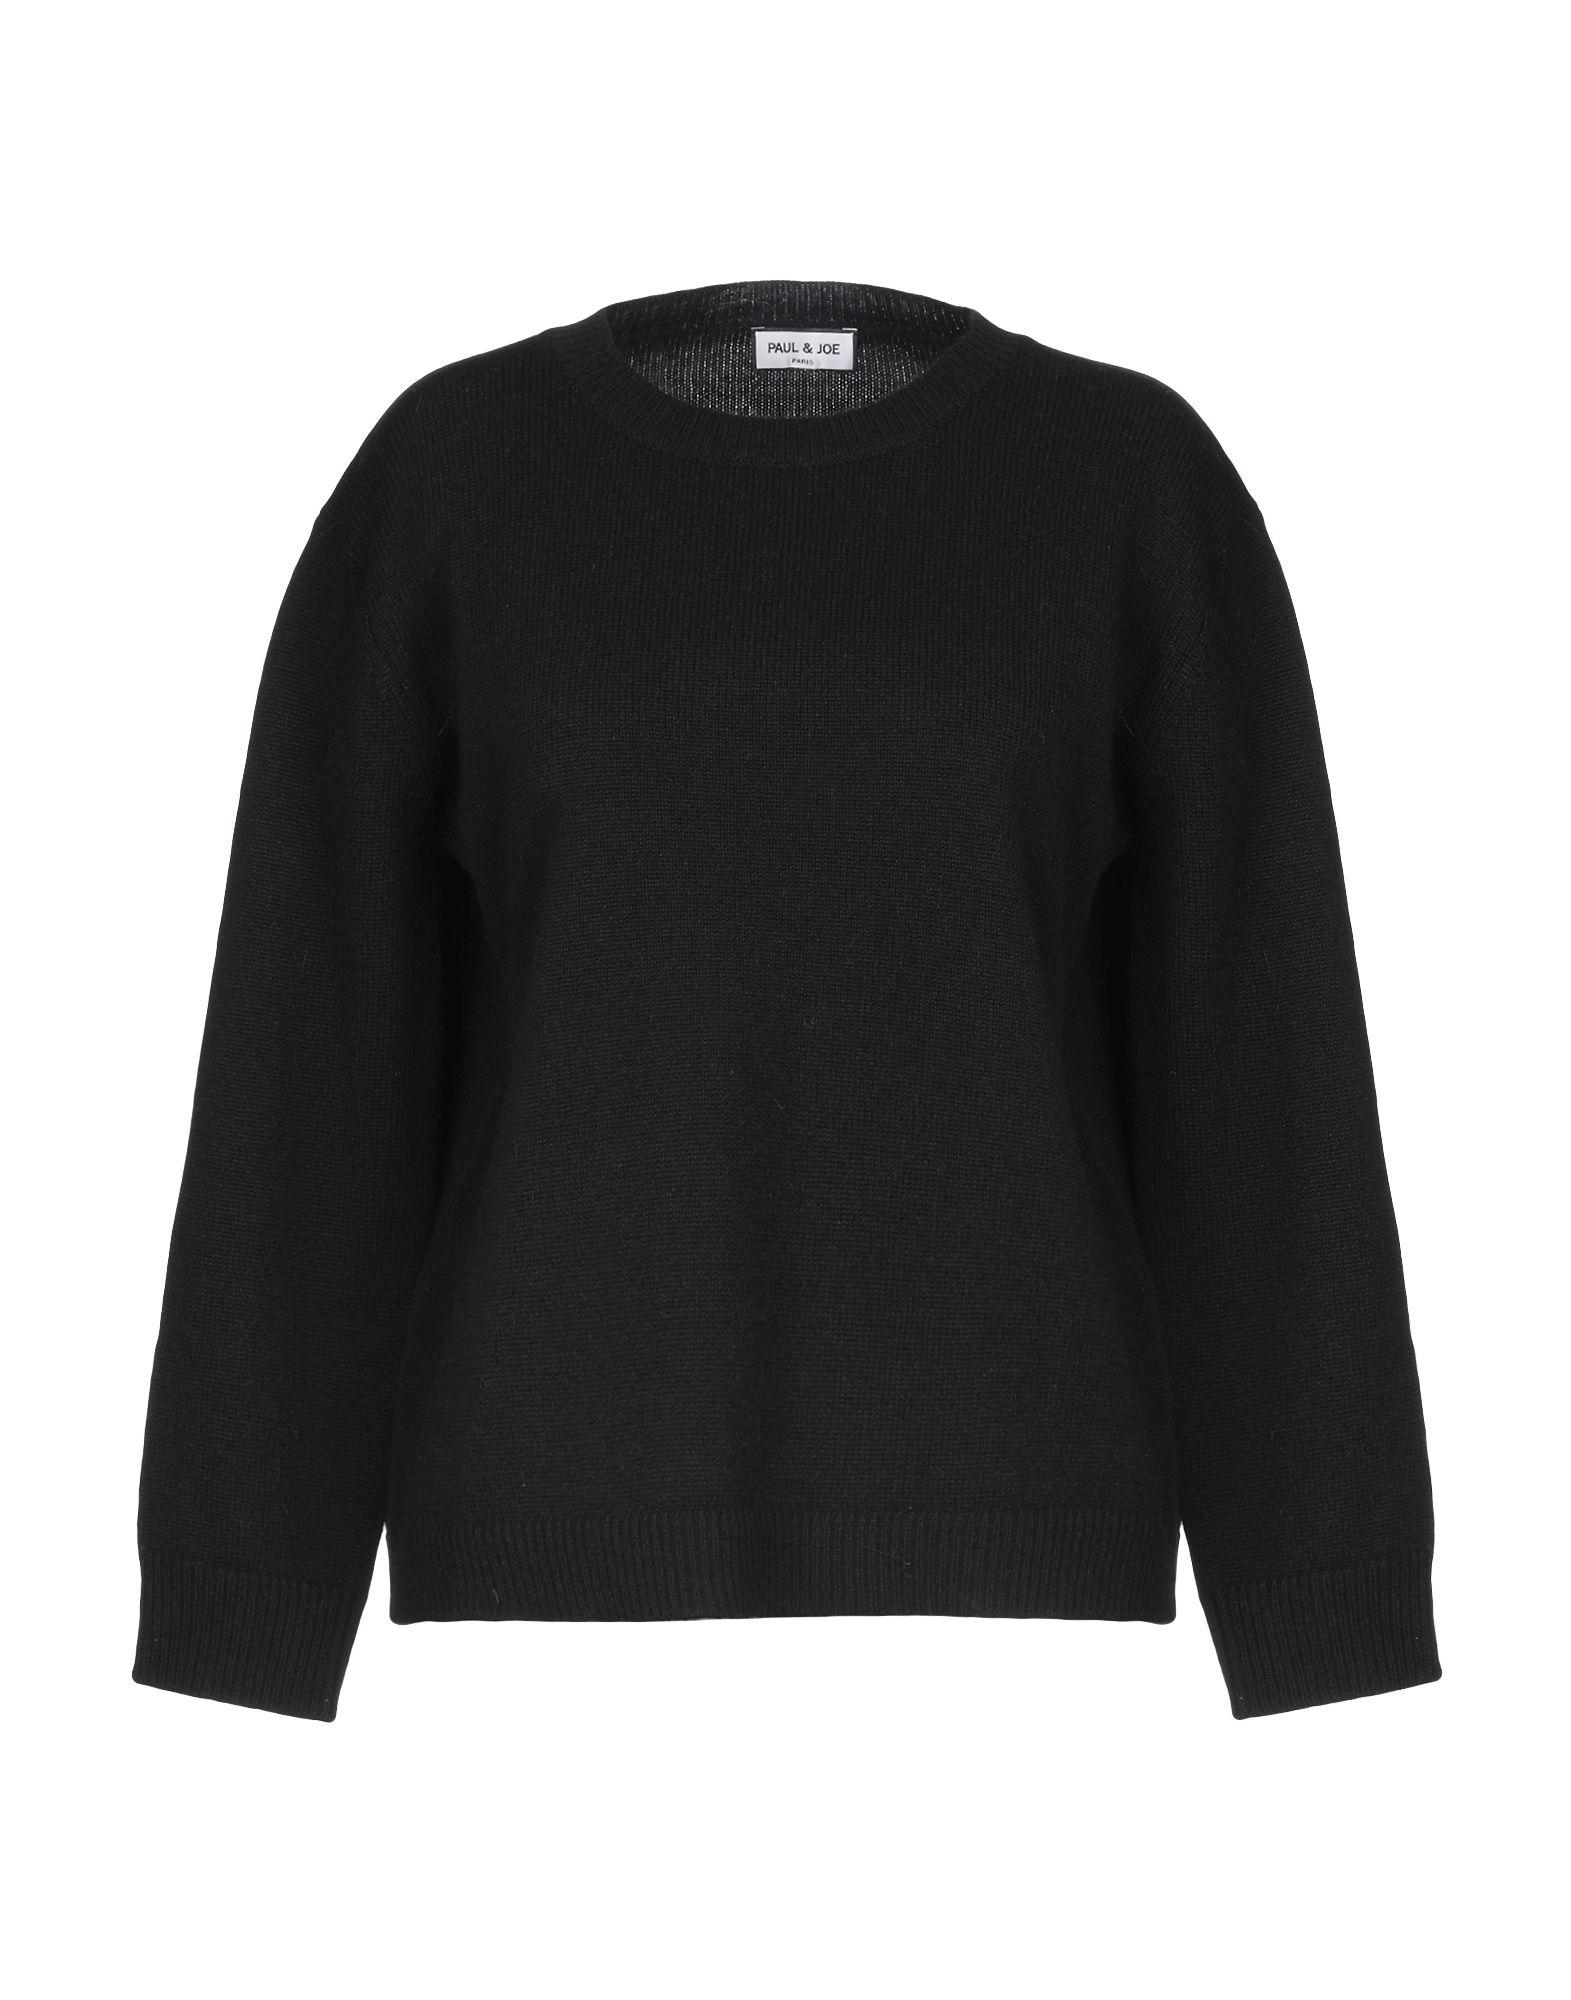 Pullover paul & joe femme. noir. 1 - 2 - 3...